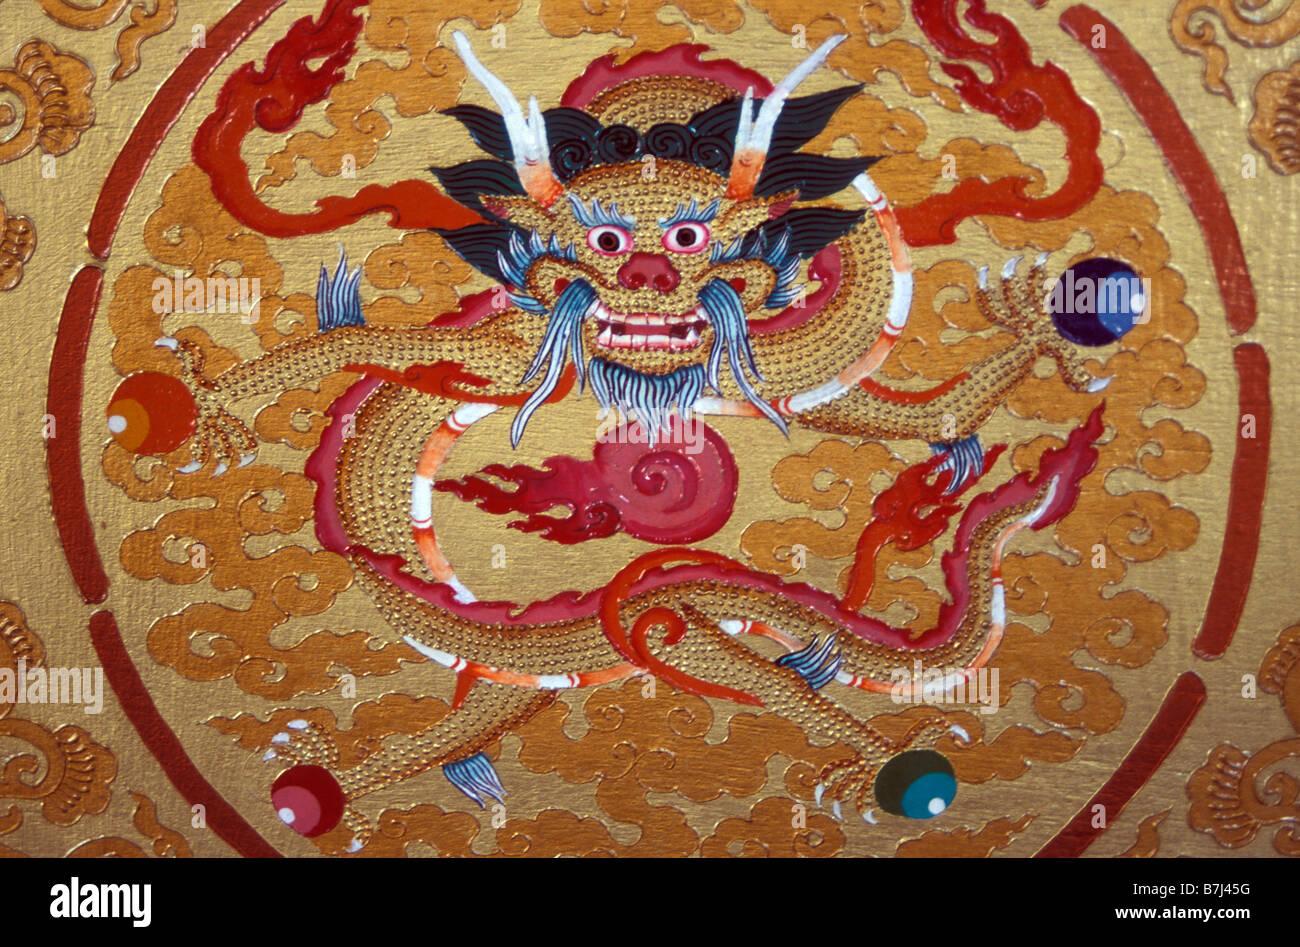 dragon painted on cabinet Leh gompa Ladakh Jammu and Kashmir India Stock  Photo - Alamy